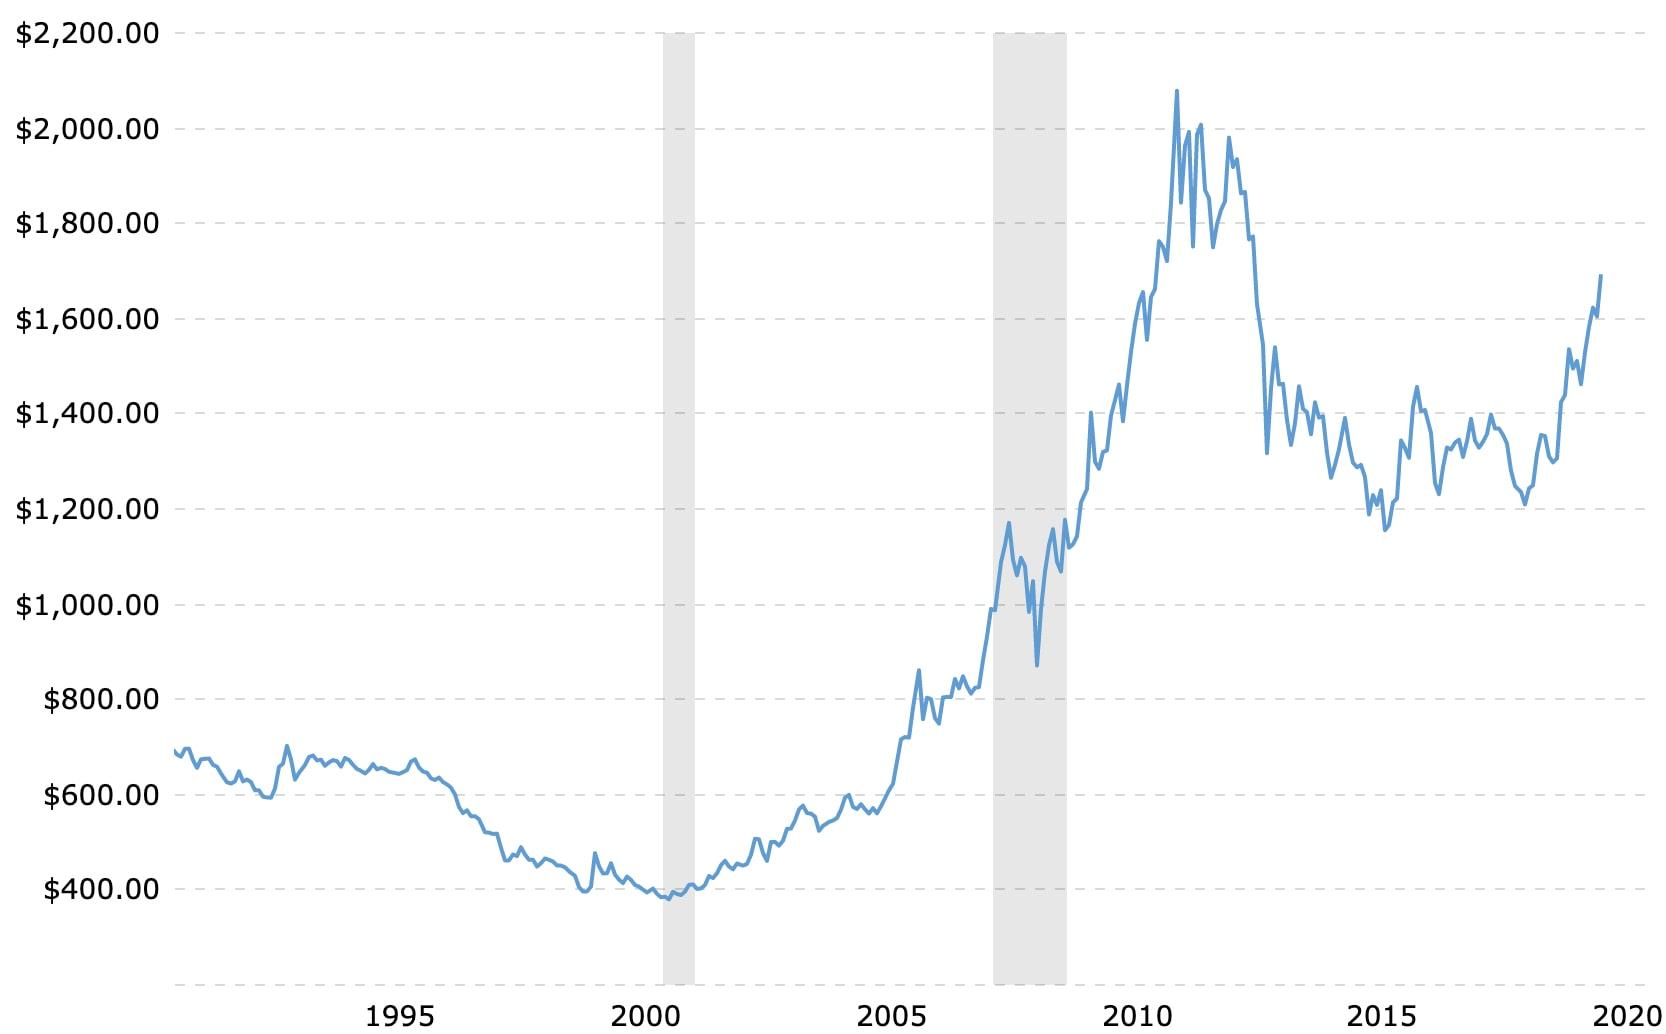 Guld priser 30 år